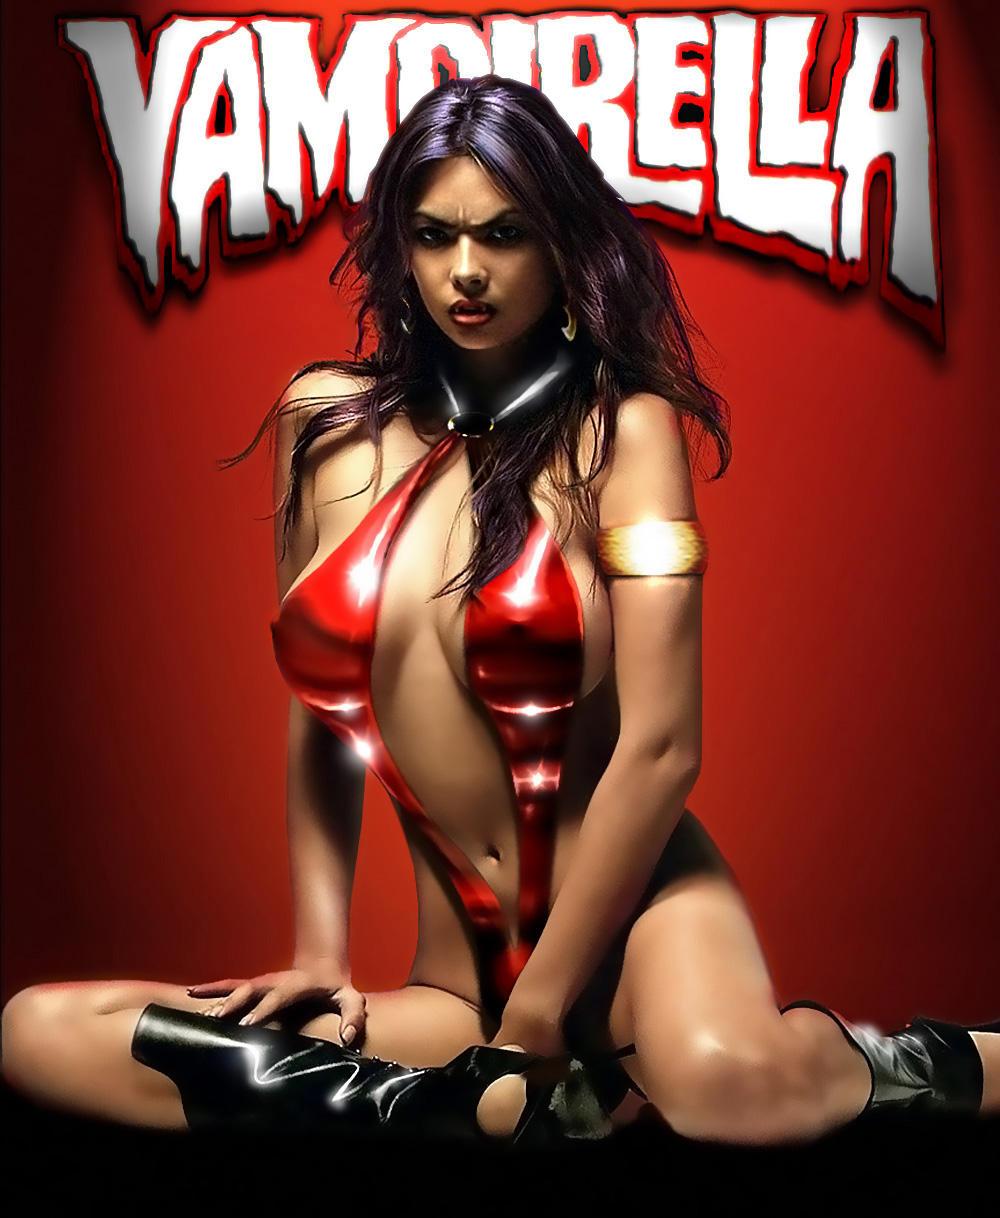 Video porno vampirella erotic movies